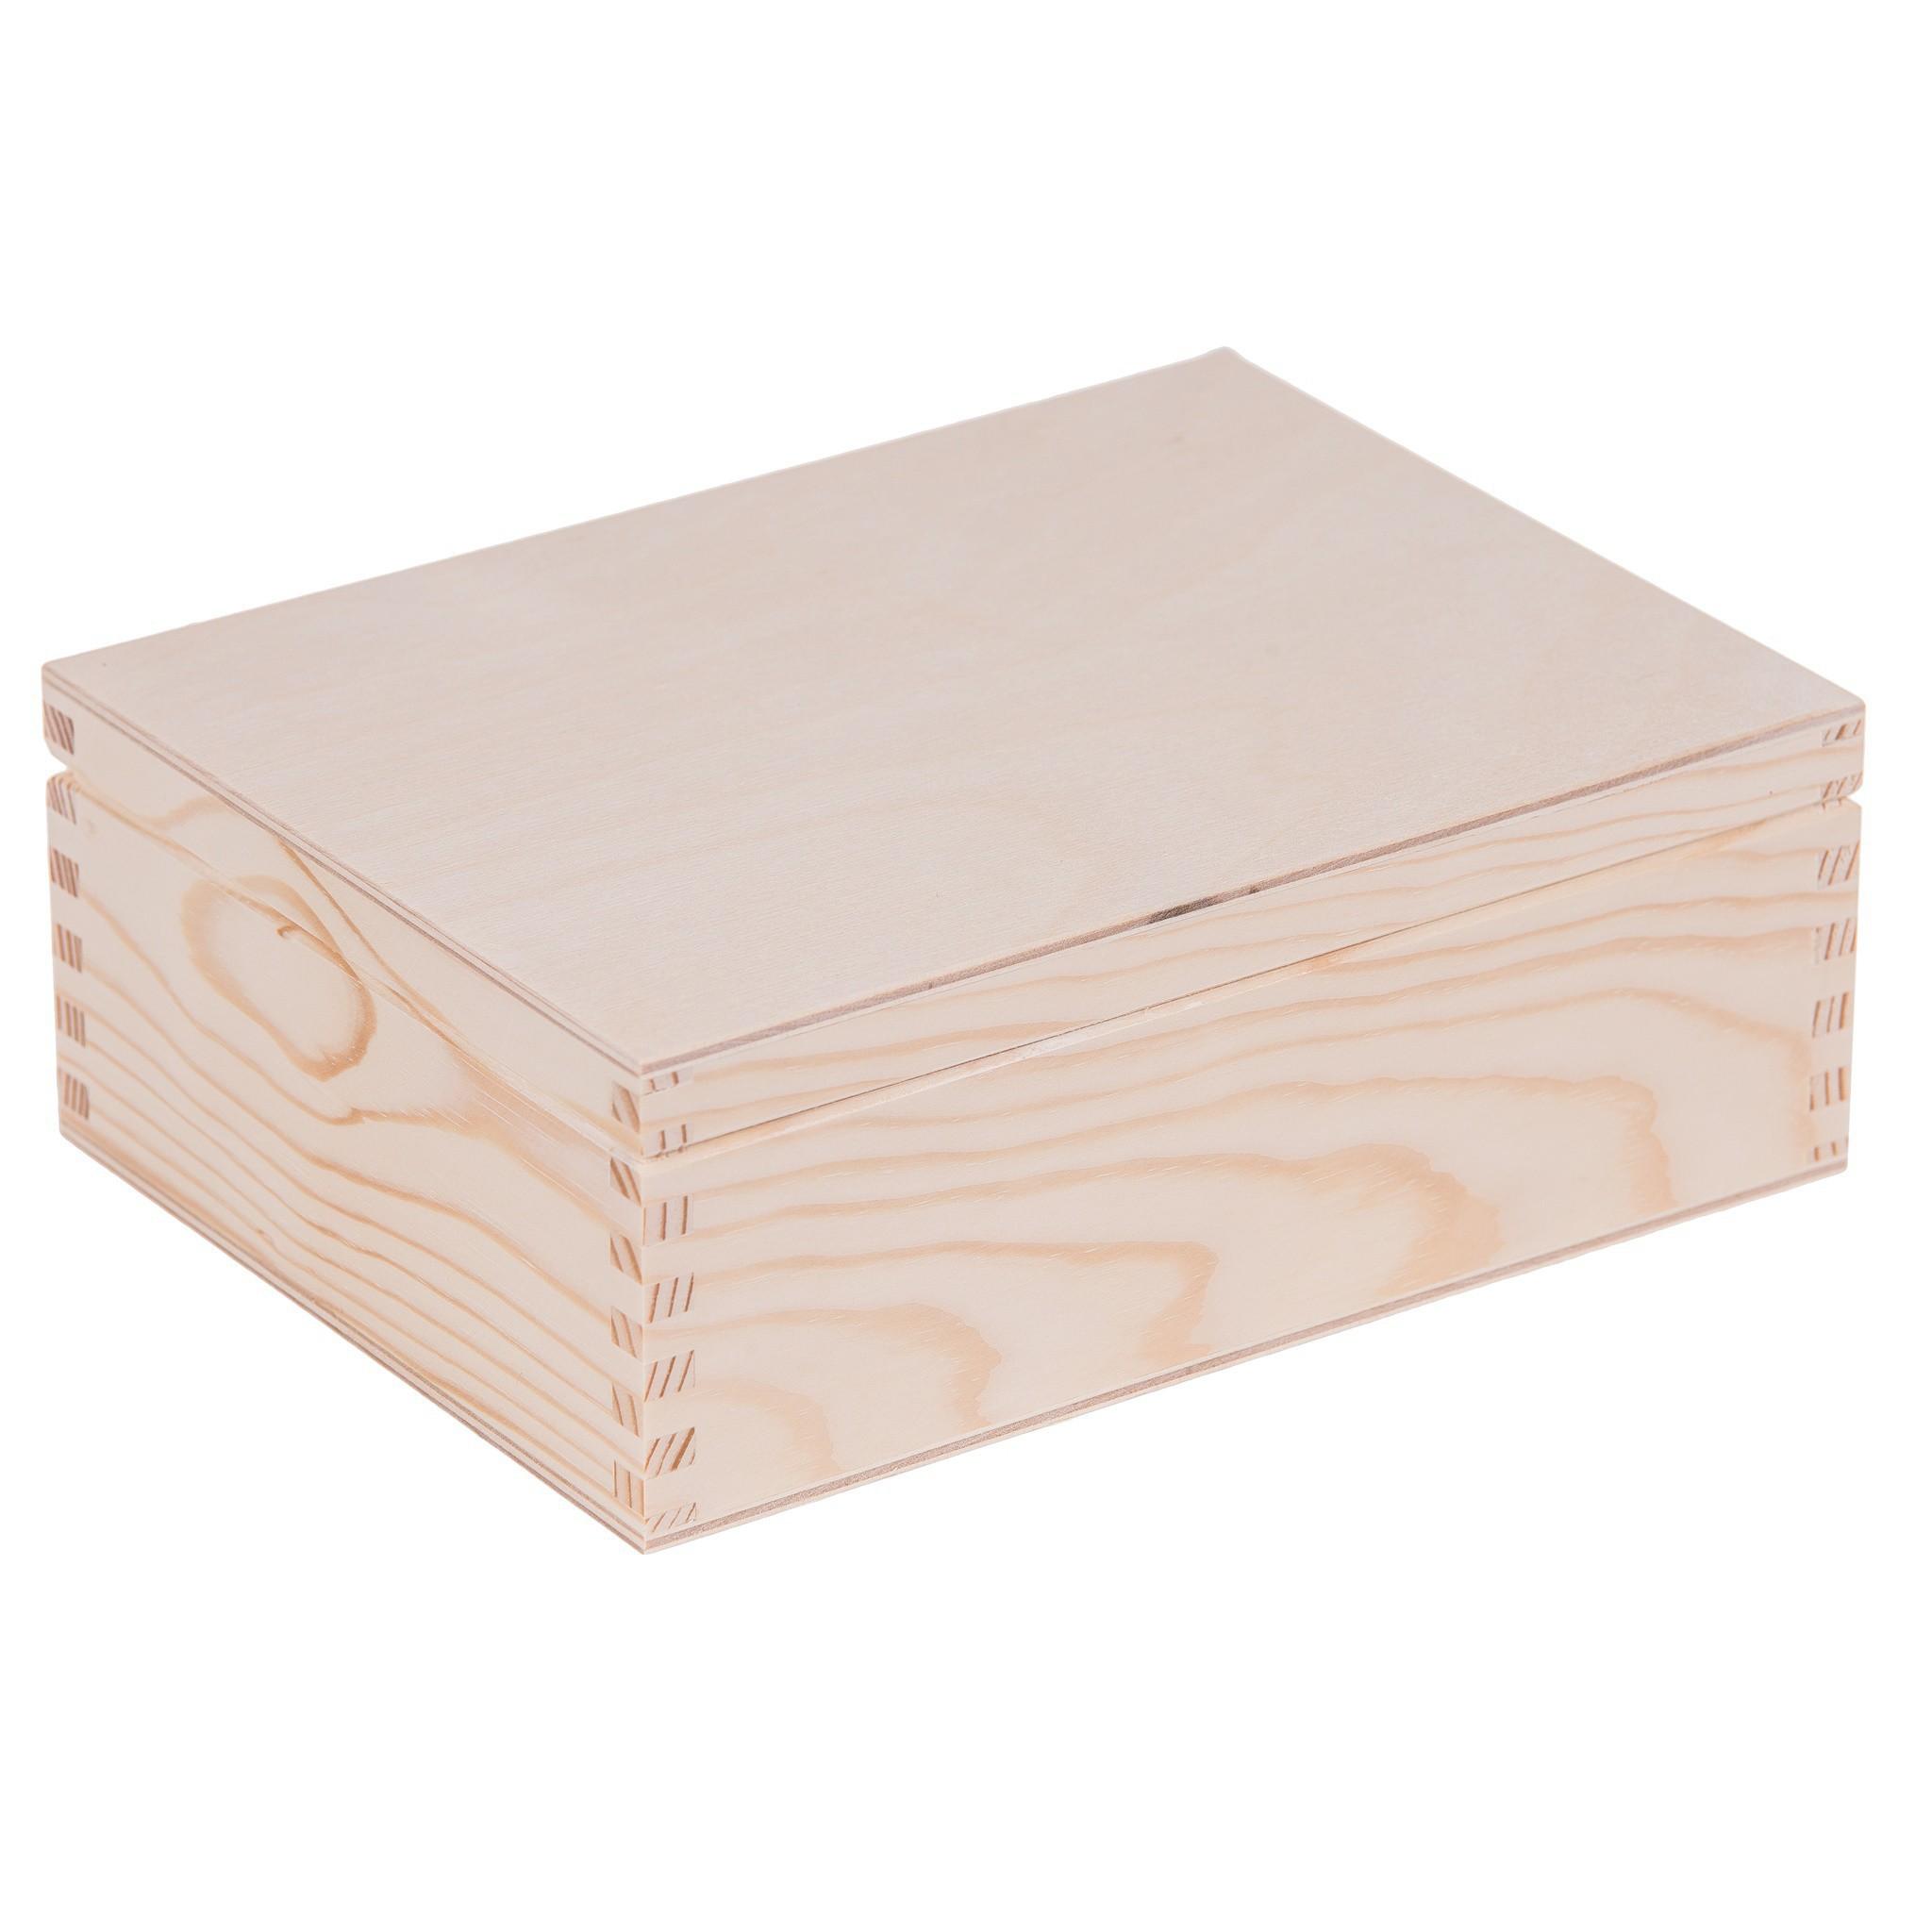 drevená krabička 6 priehradok borovica 16x22x8cm megamix.sk